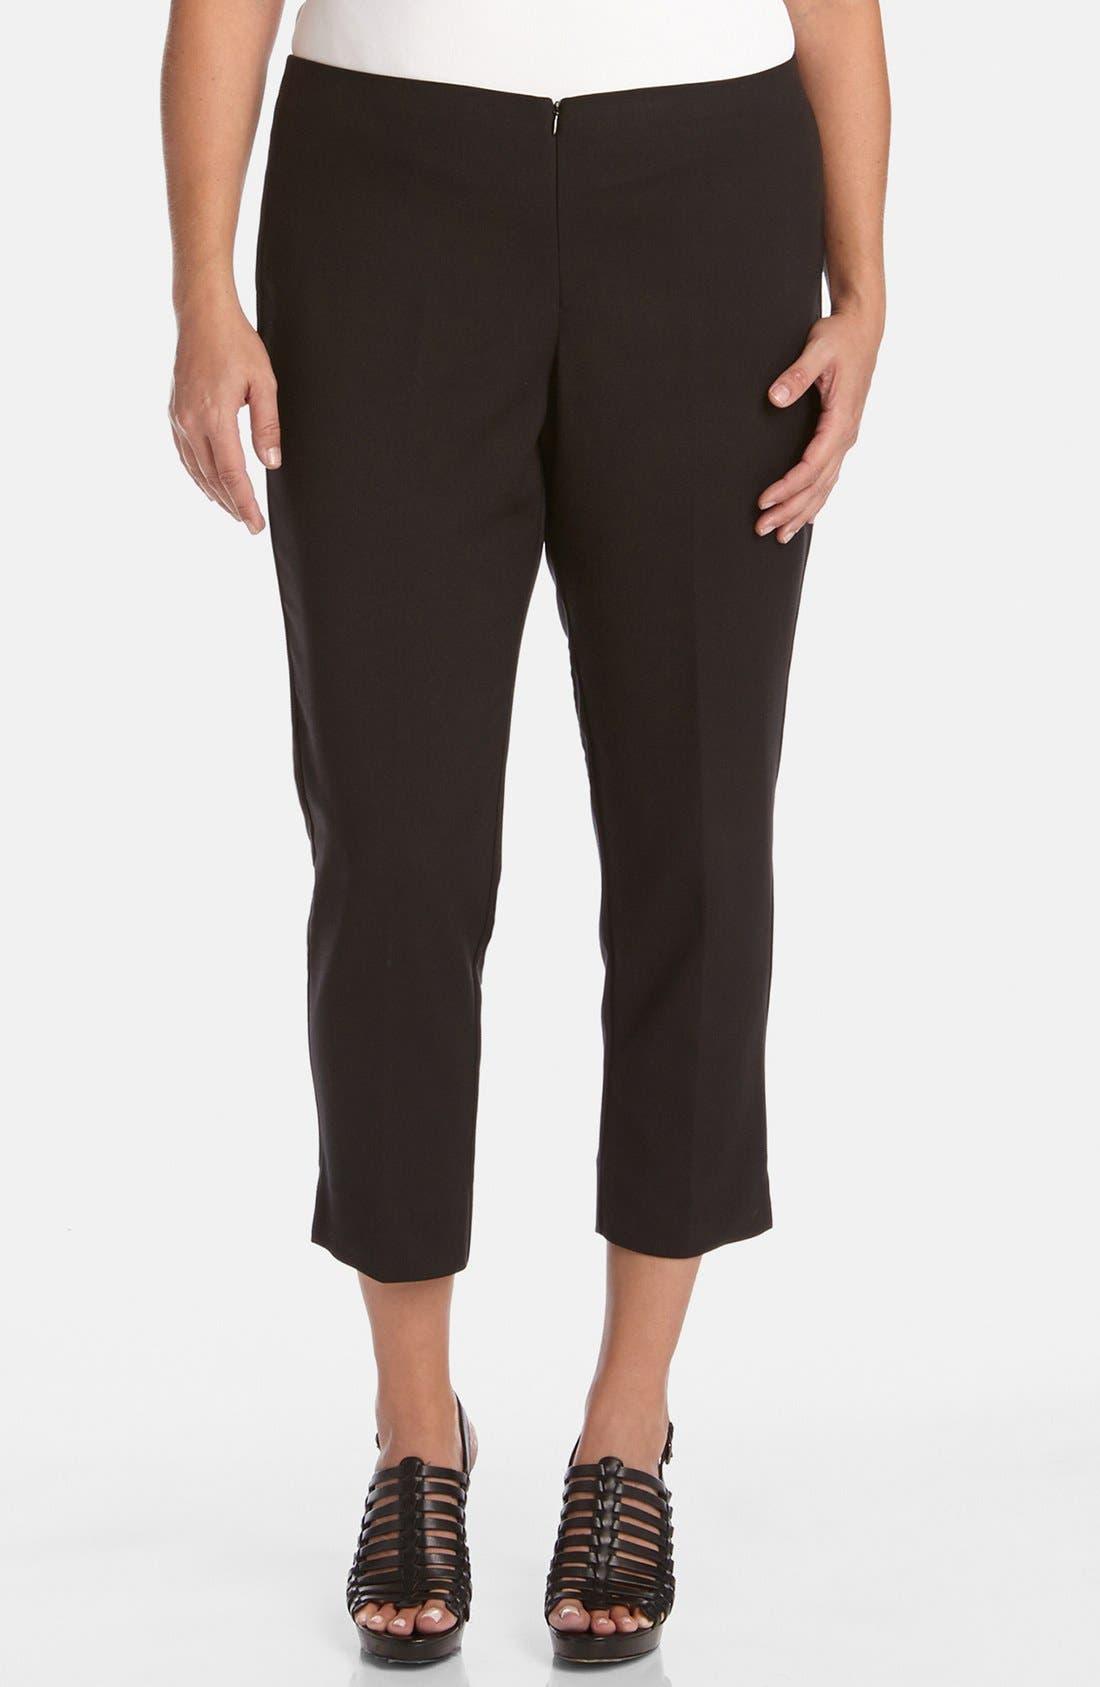 KAREN KANE Stretch Capri Pants, Main, color, BLACK